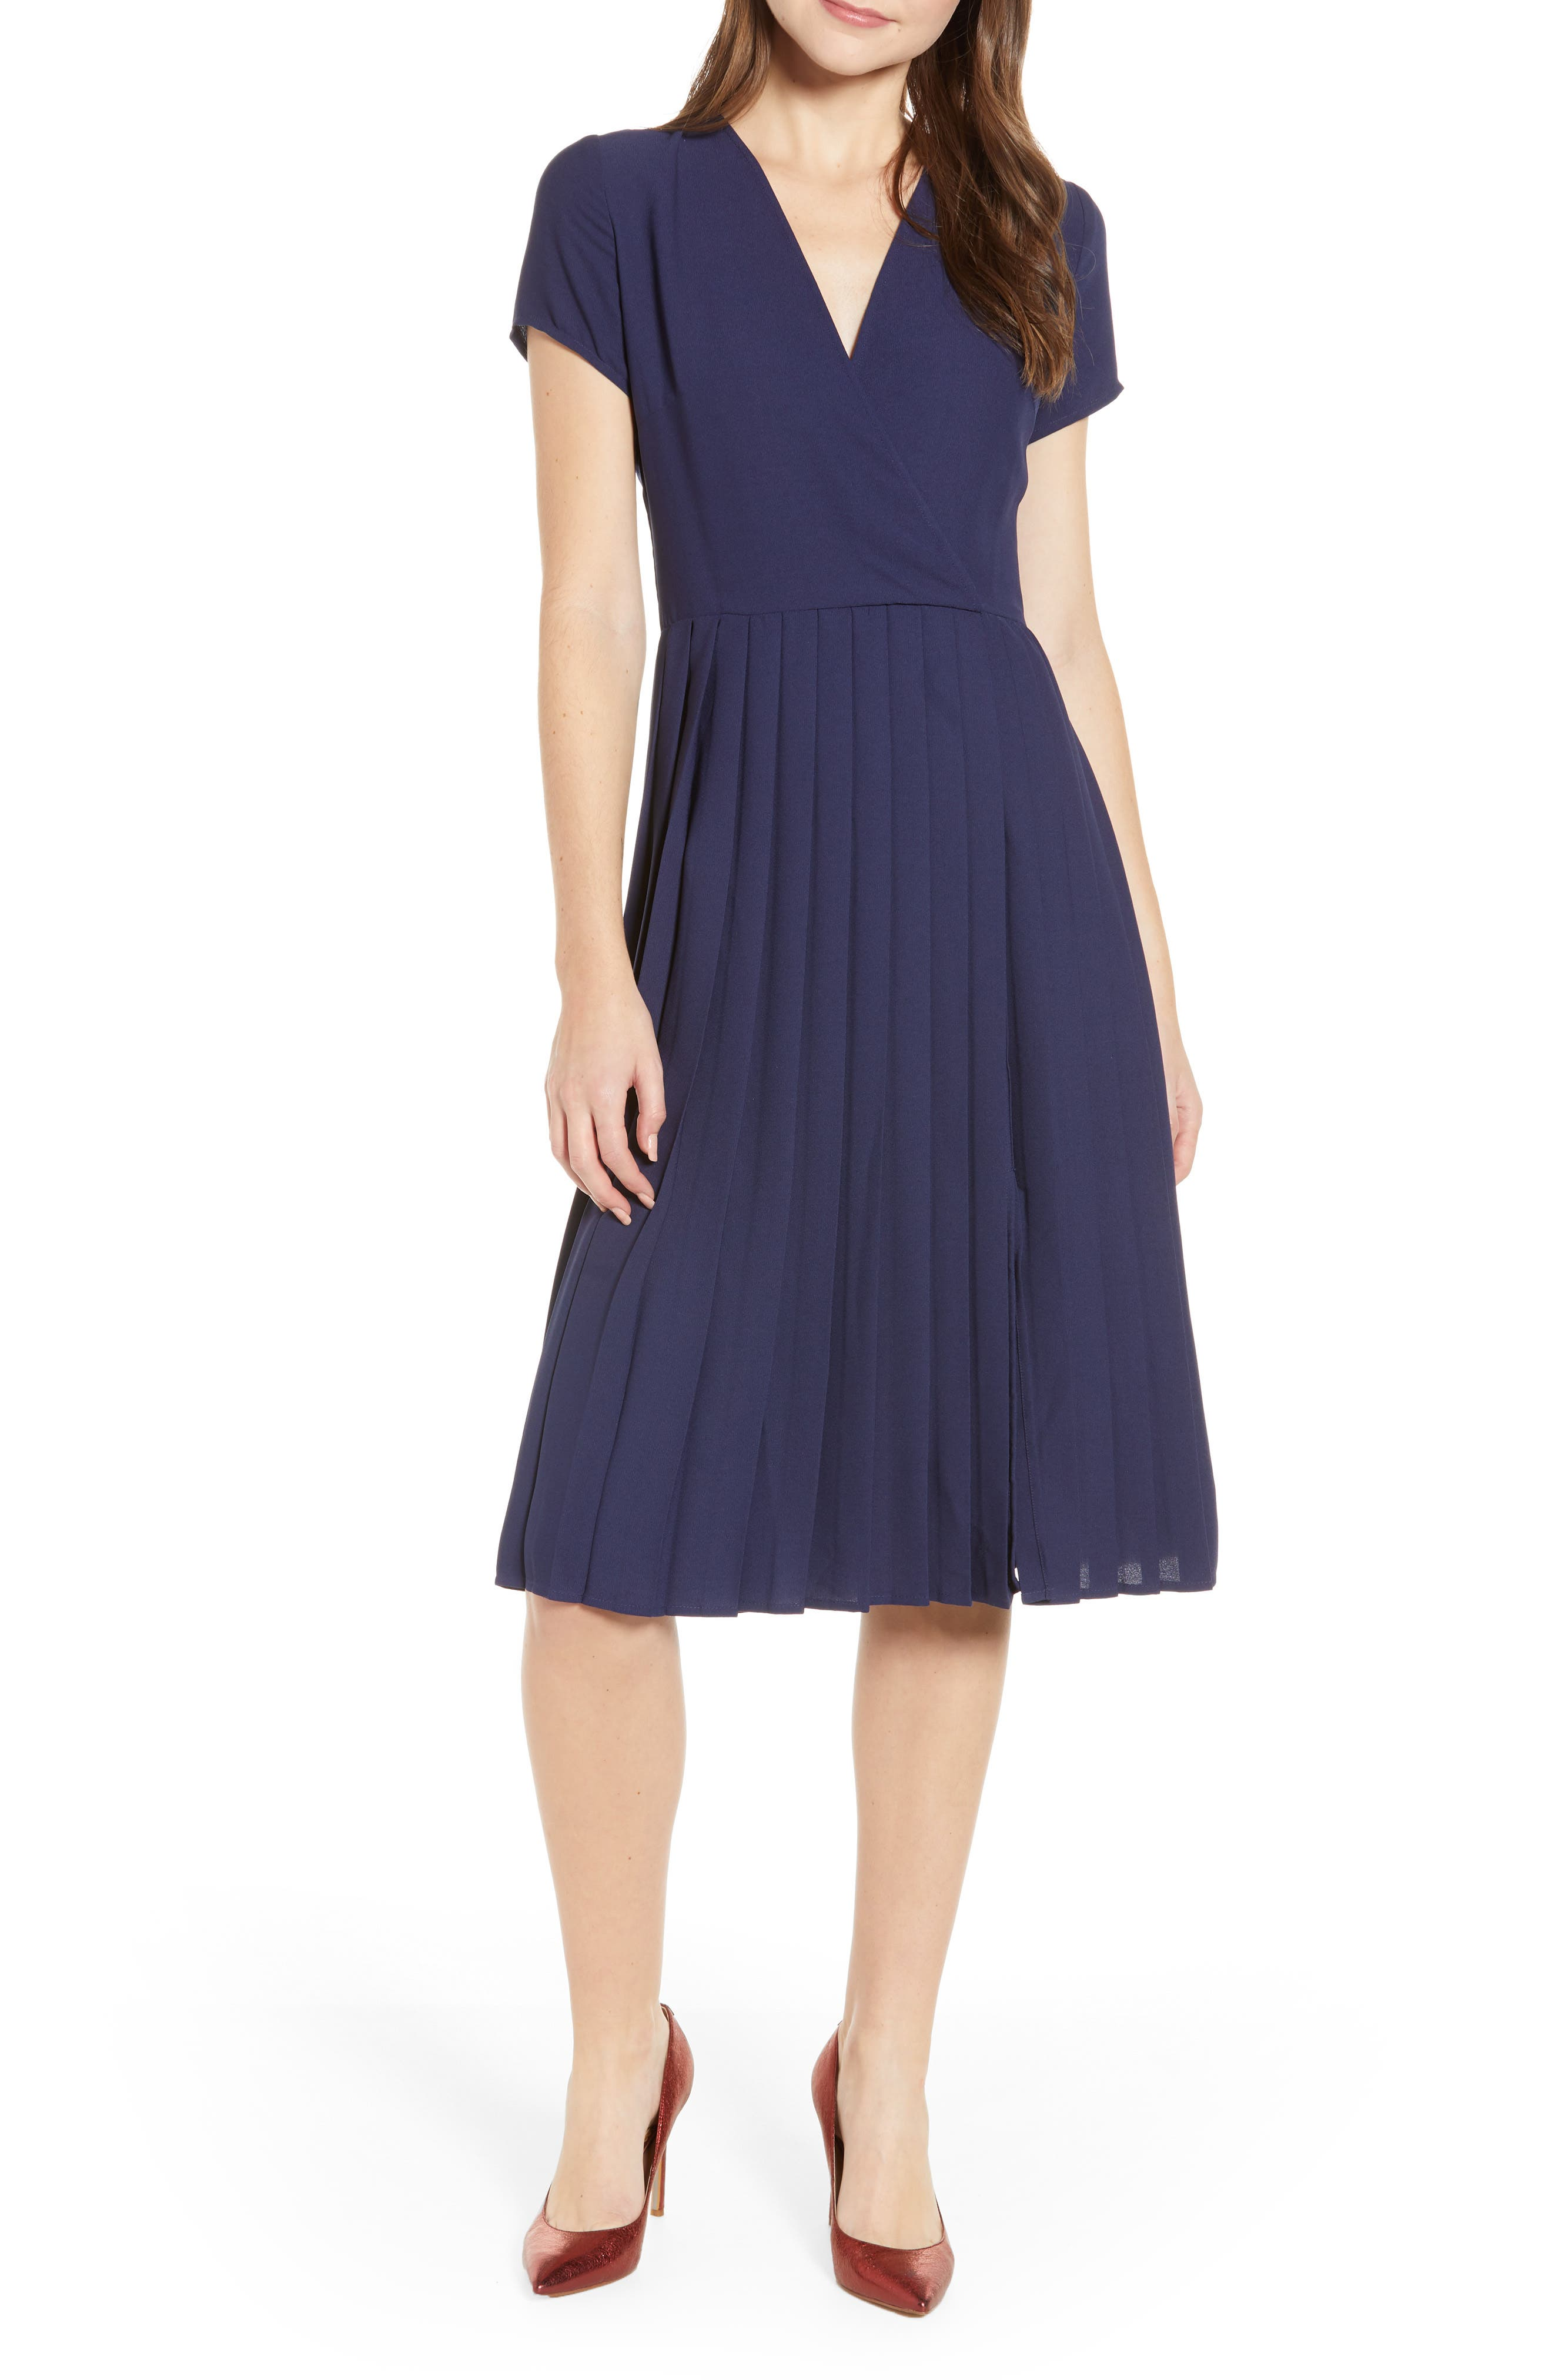 LEITH,                             Pleated Surplice Dress,                             Main thumbnail 1, color,                             NAVY PEACOAT